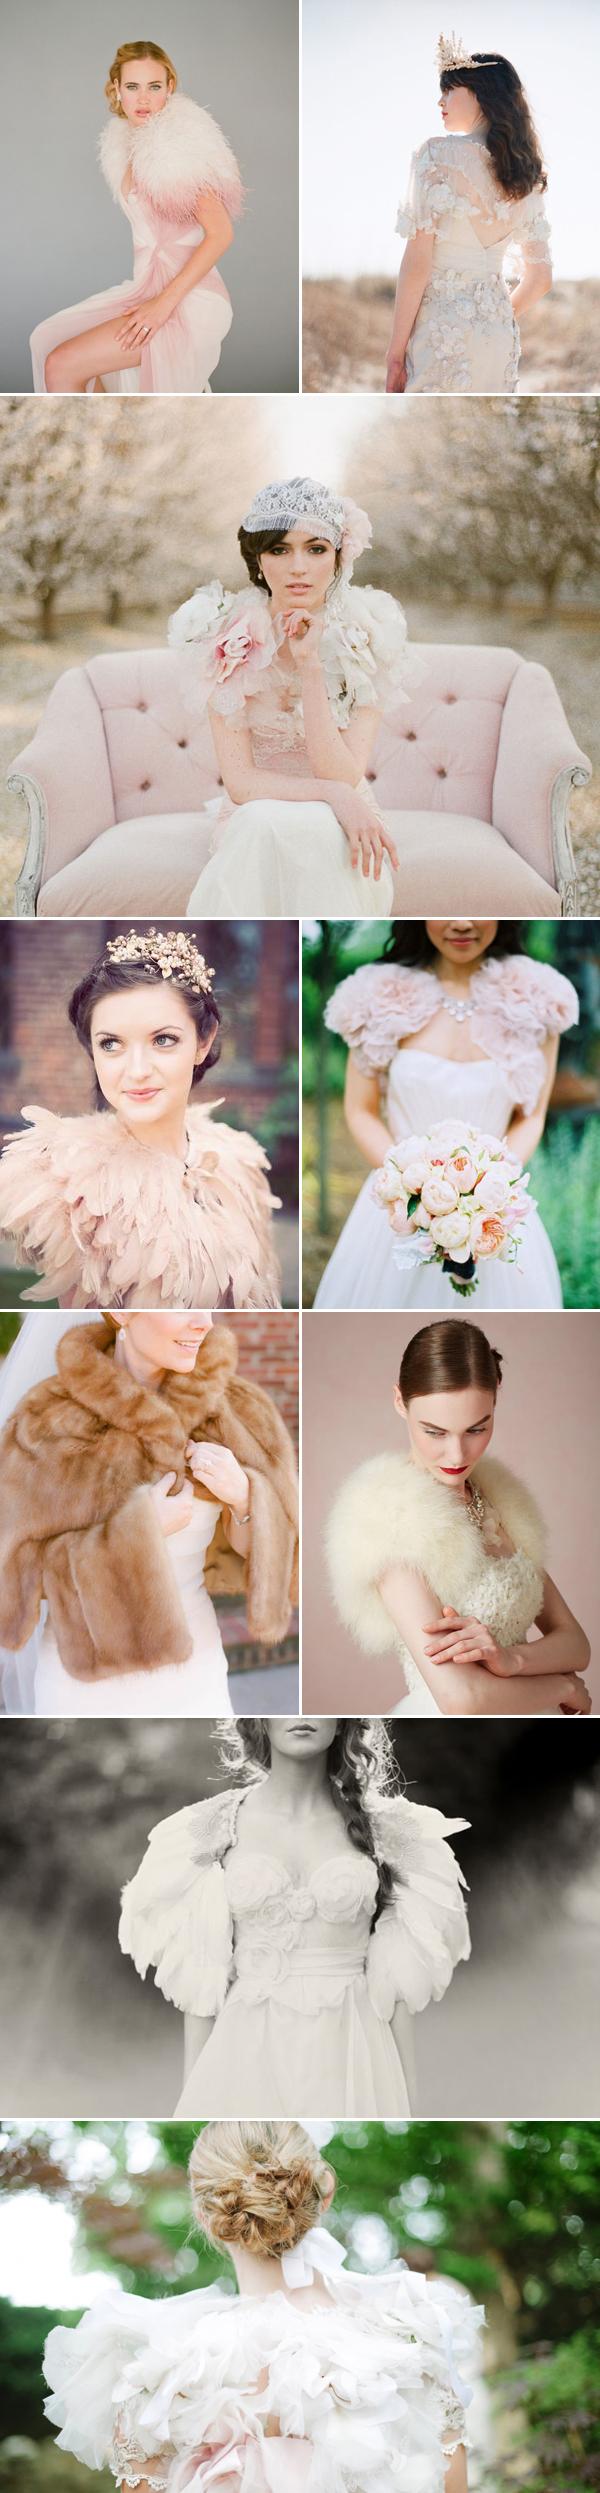 Bridal-coverup03-boleros